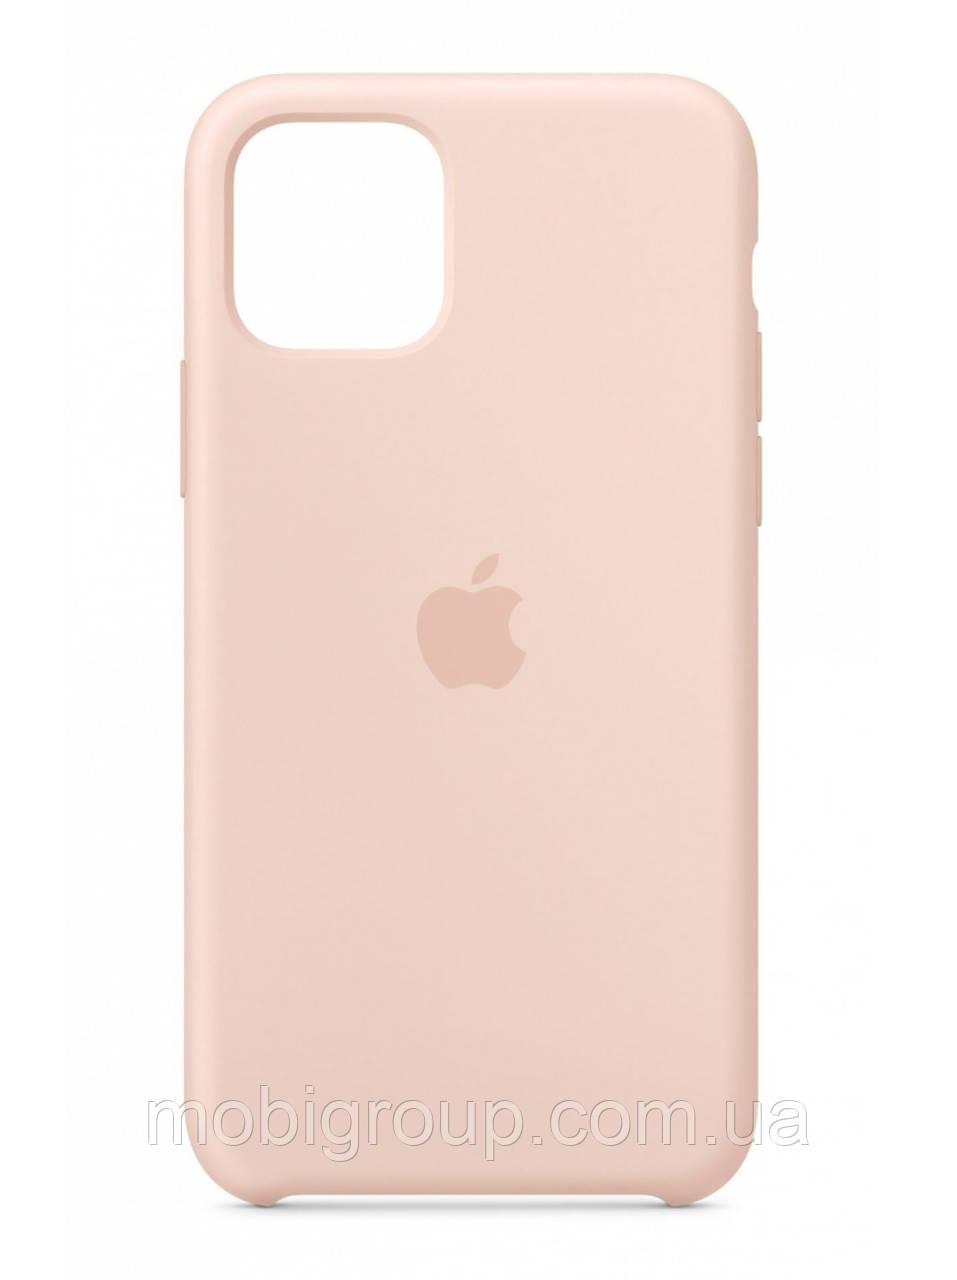 Чехол Silicone Case для iPhone 11 Pro, Pink Sand